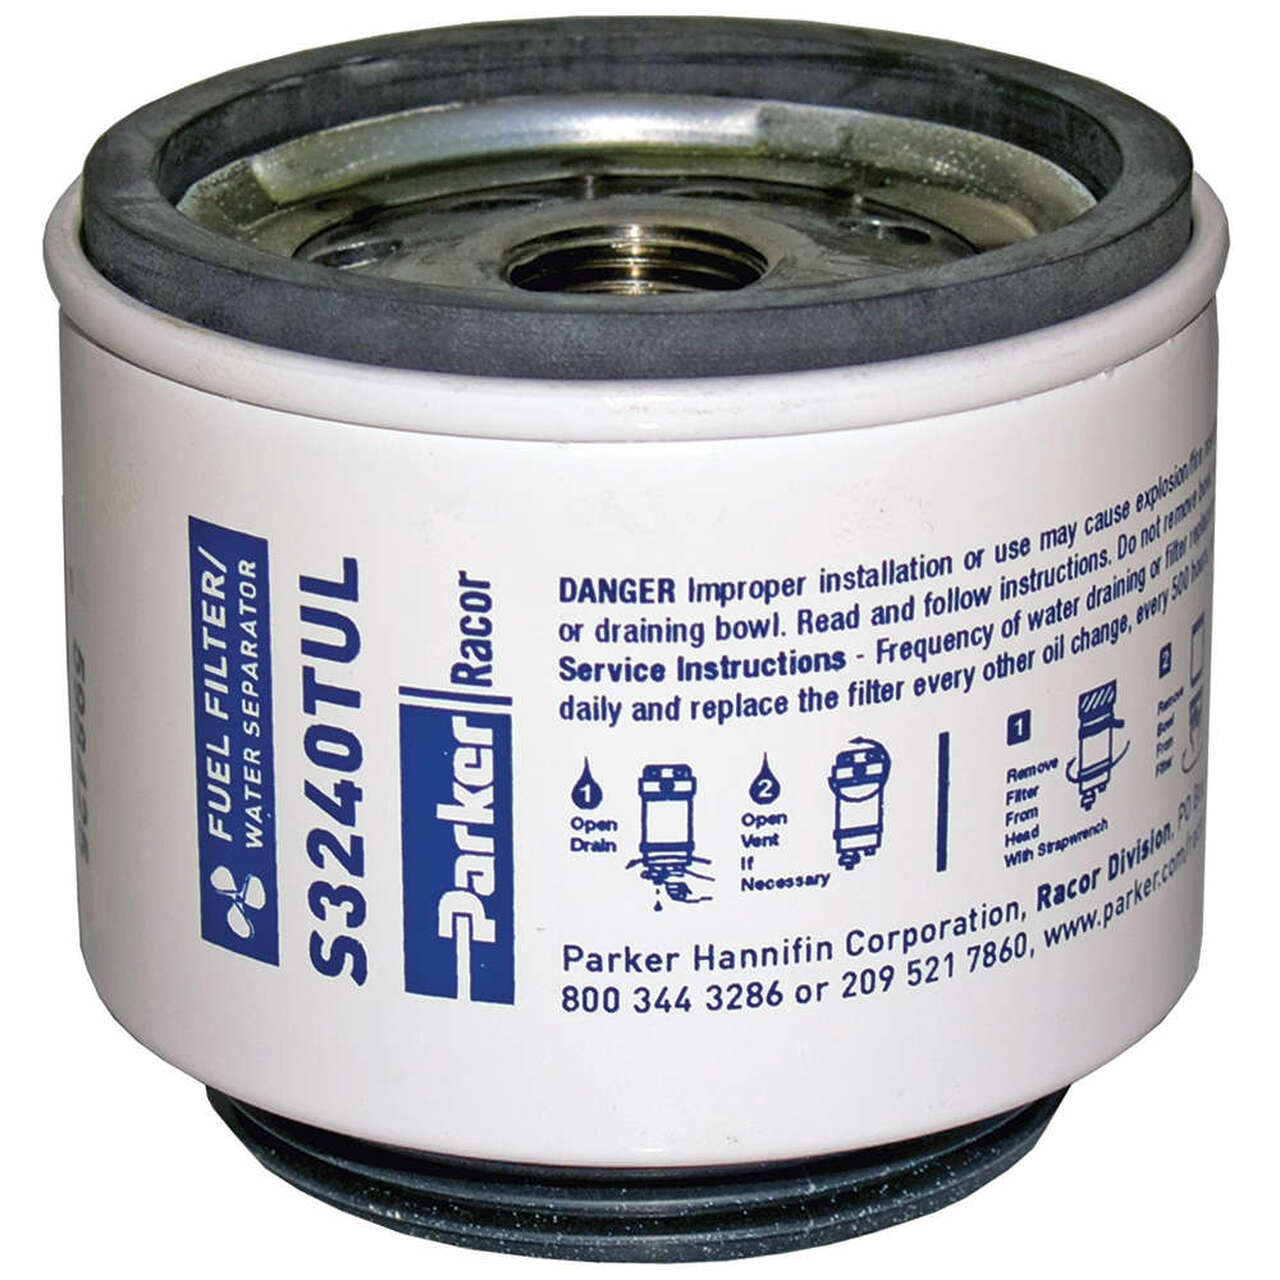 racor m18 marine aquabloc replacement gasoline filters s3240tul 12 qty [ 1280 x 1280 Pixel ]